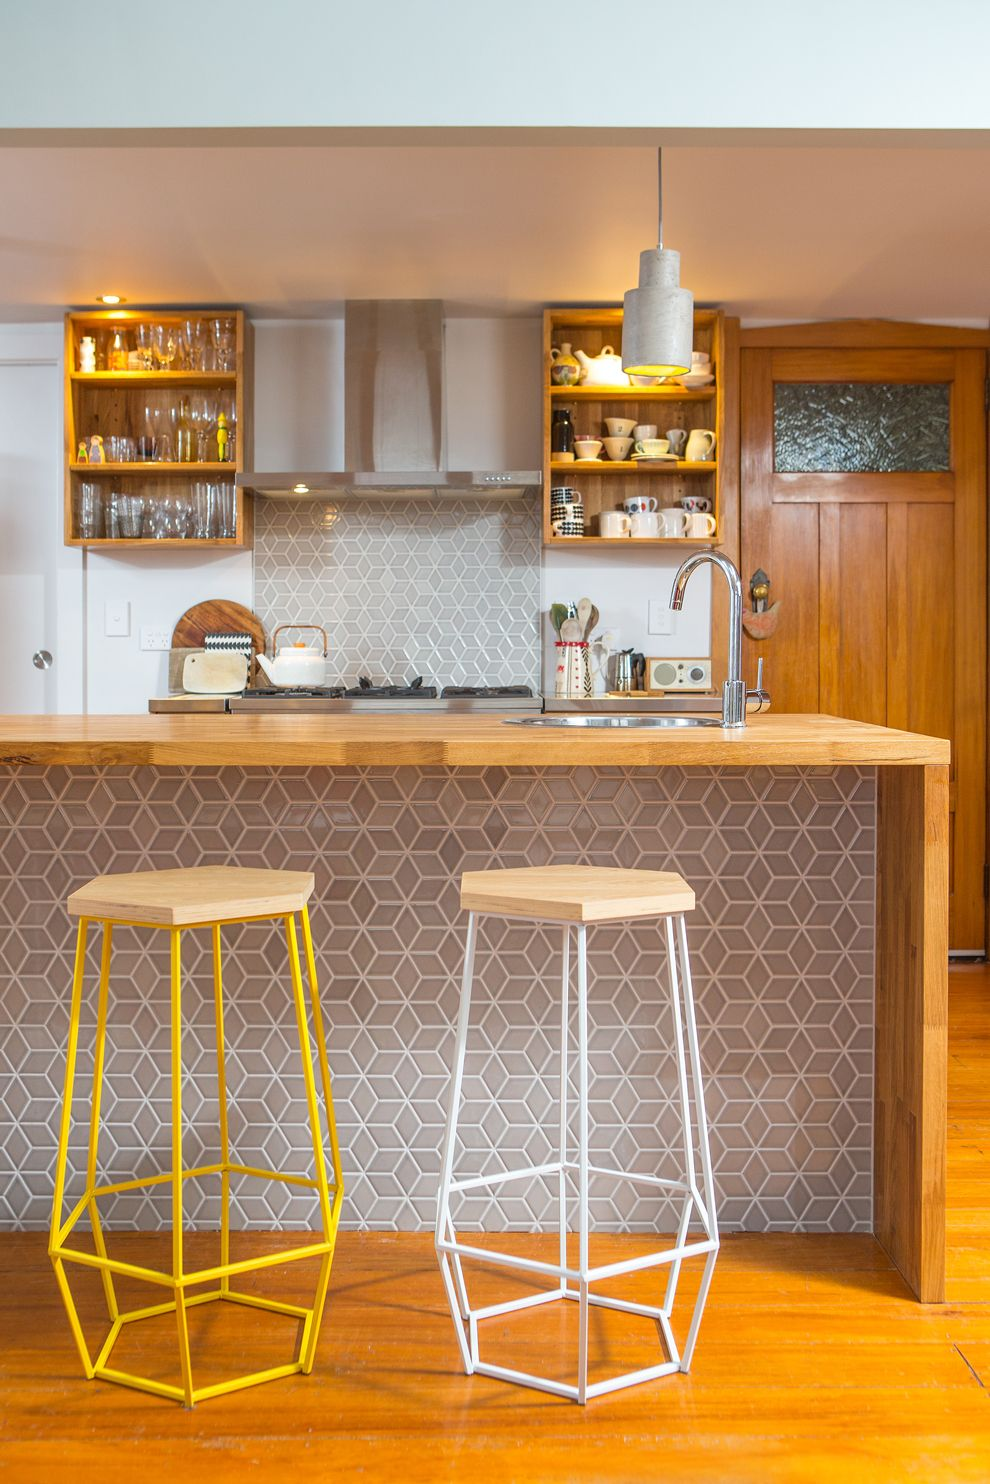 warm kitchen, wooden floor, wooden island top, hexagonal tiles under the island, geometric stool with wooden top, grey backsplash, white wall, wooden floating shelves